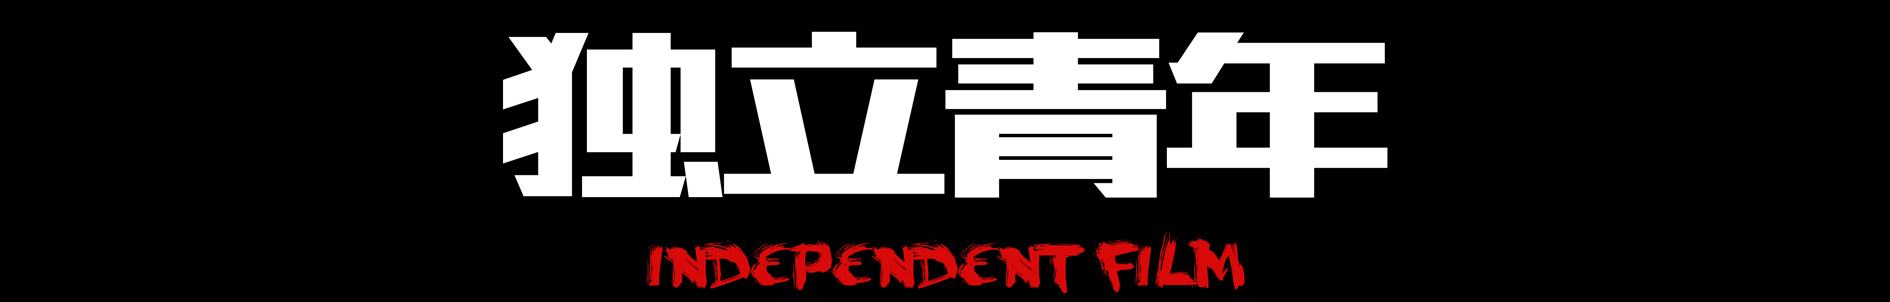 独立青年影像 banner